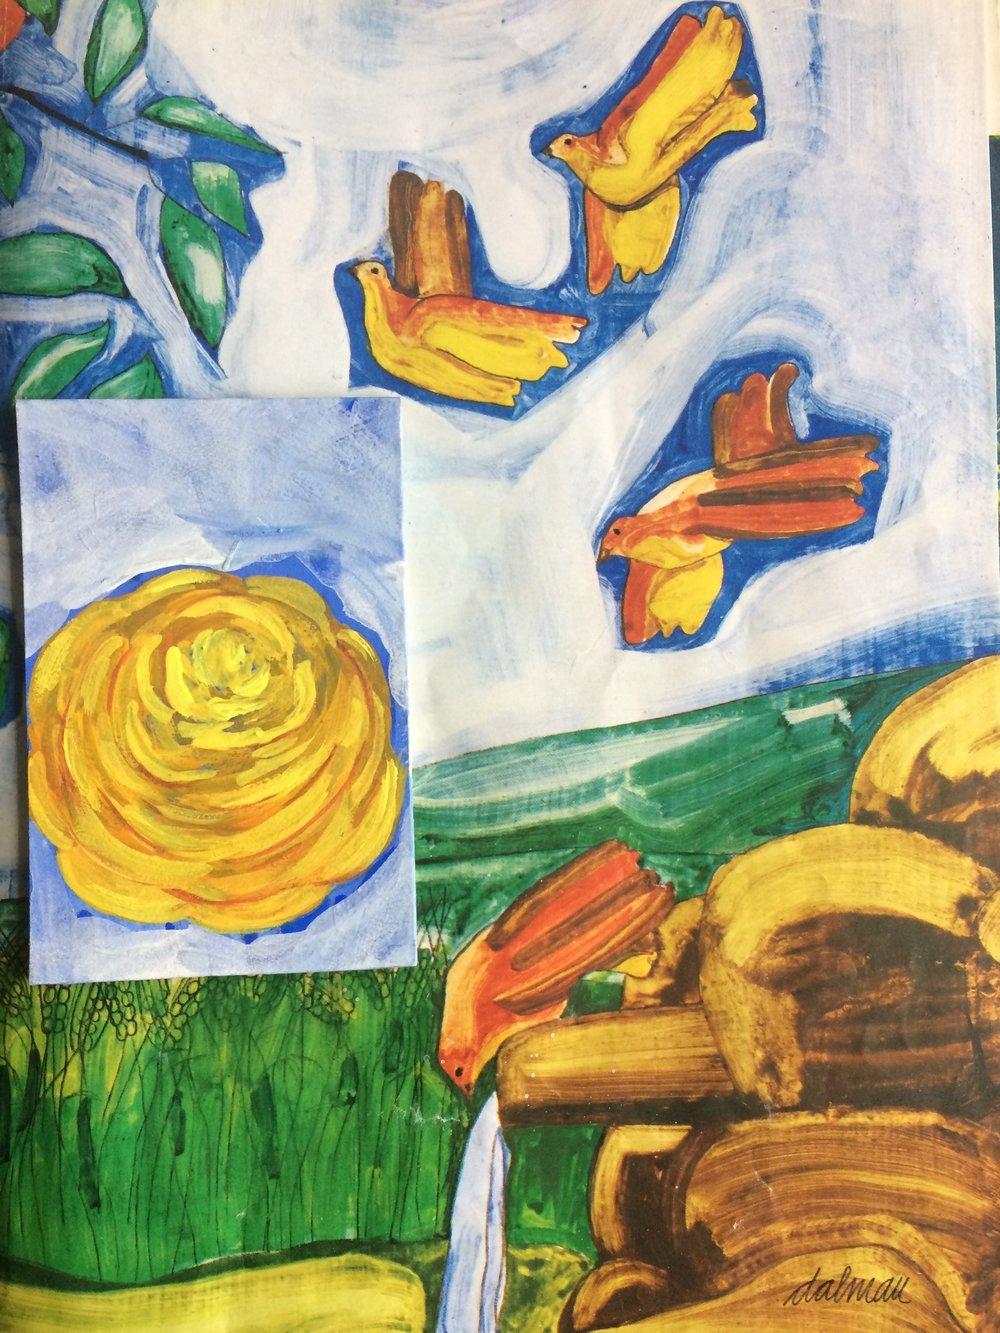 painterly strokes